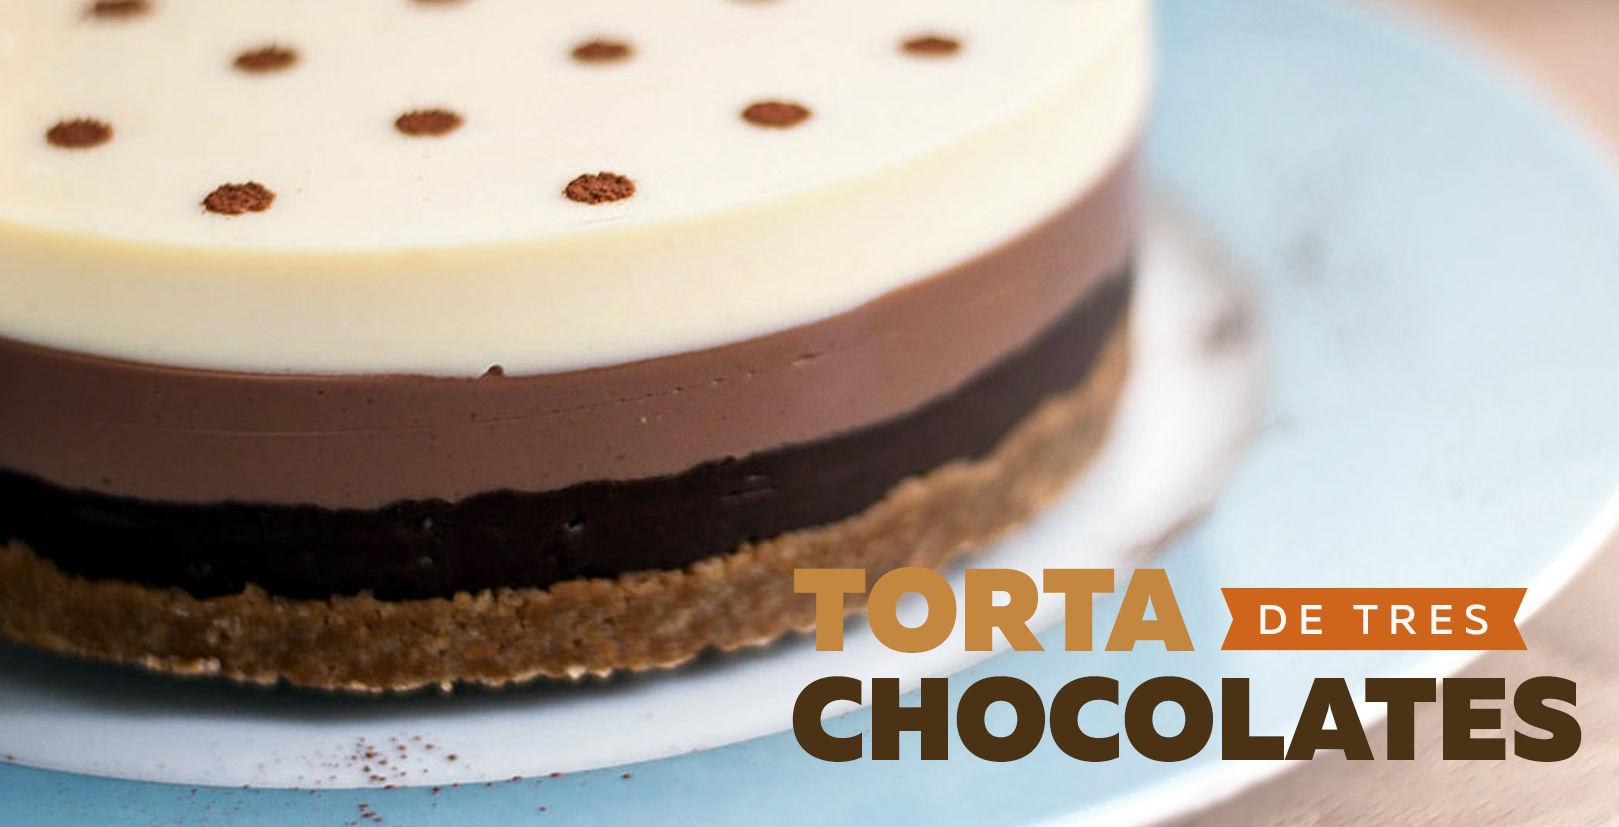 Torta de 3 chocolates